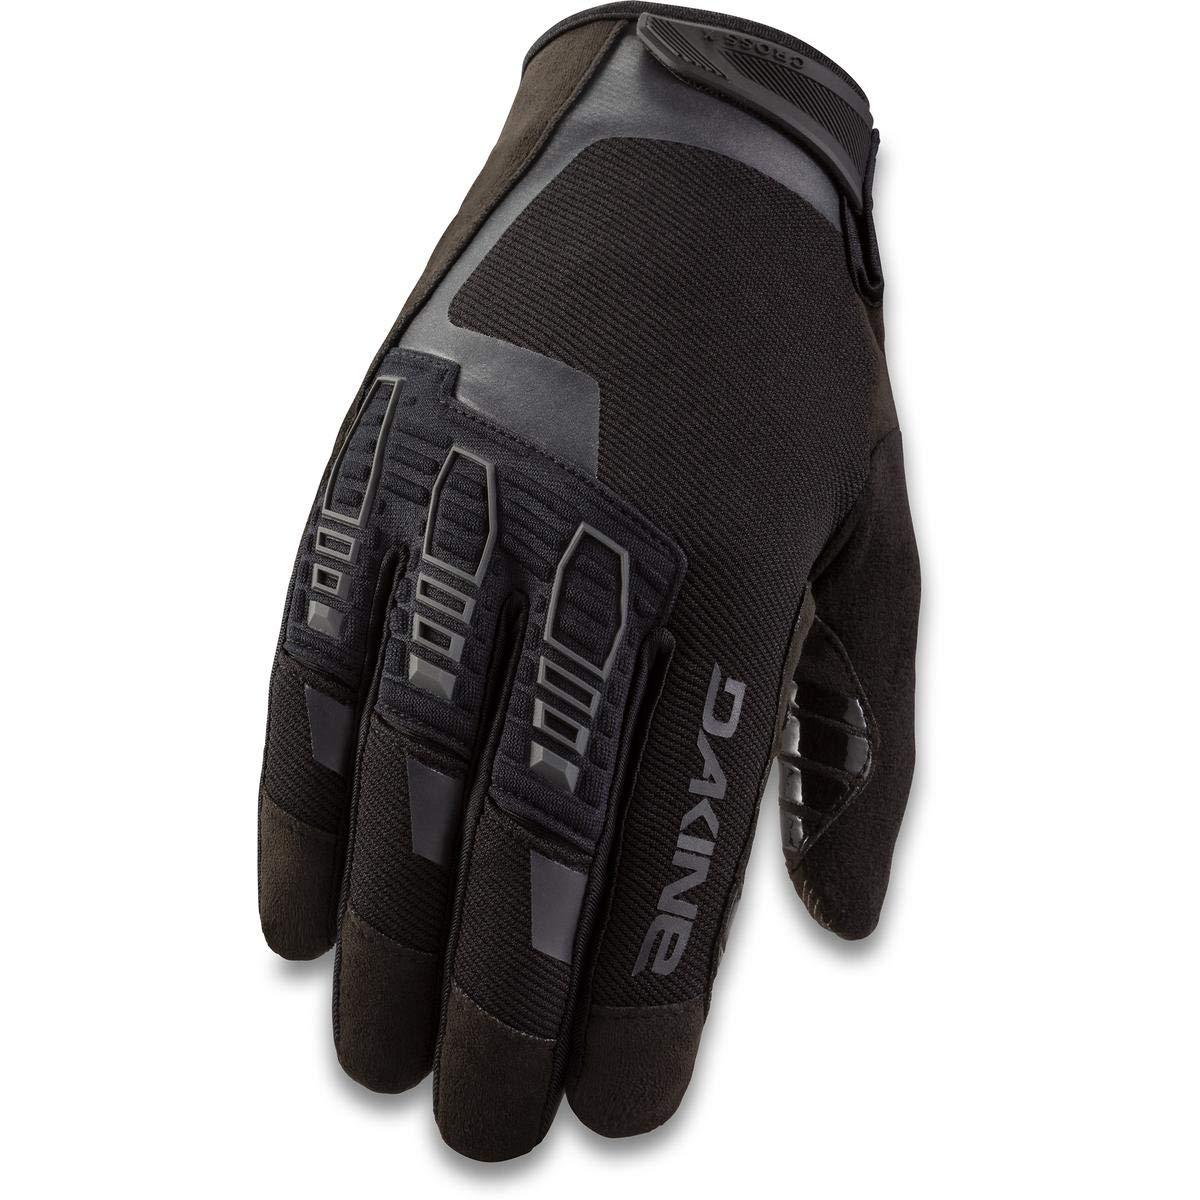 Dakine Cross-X Handschuhe Herren Black Handschuhgröße XL   9,5 2021 Fahrradhan